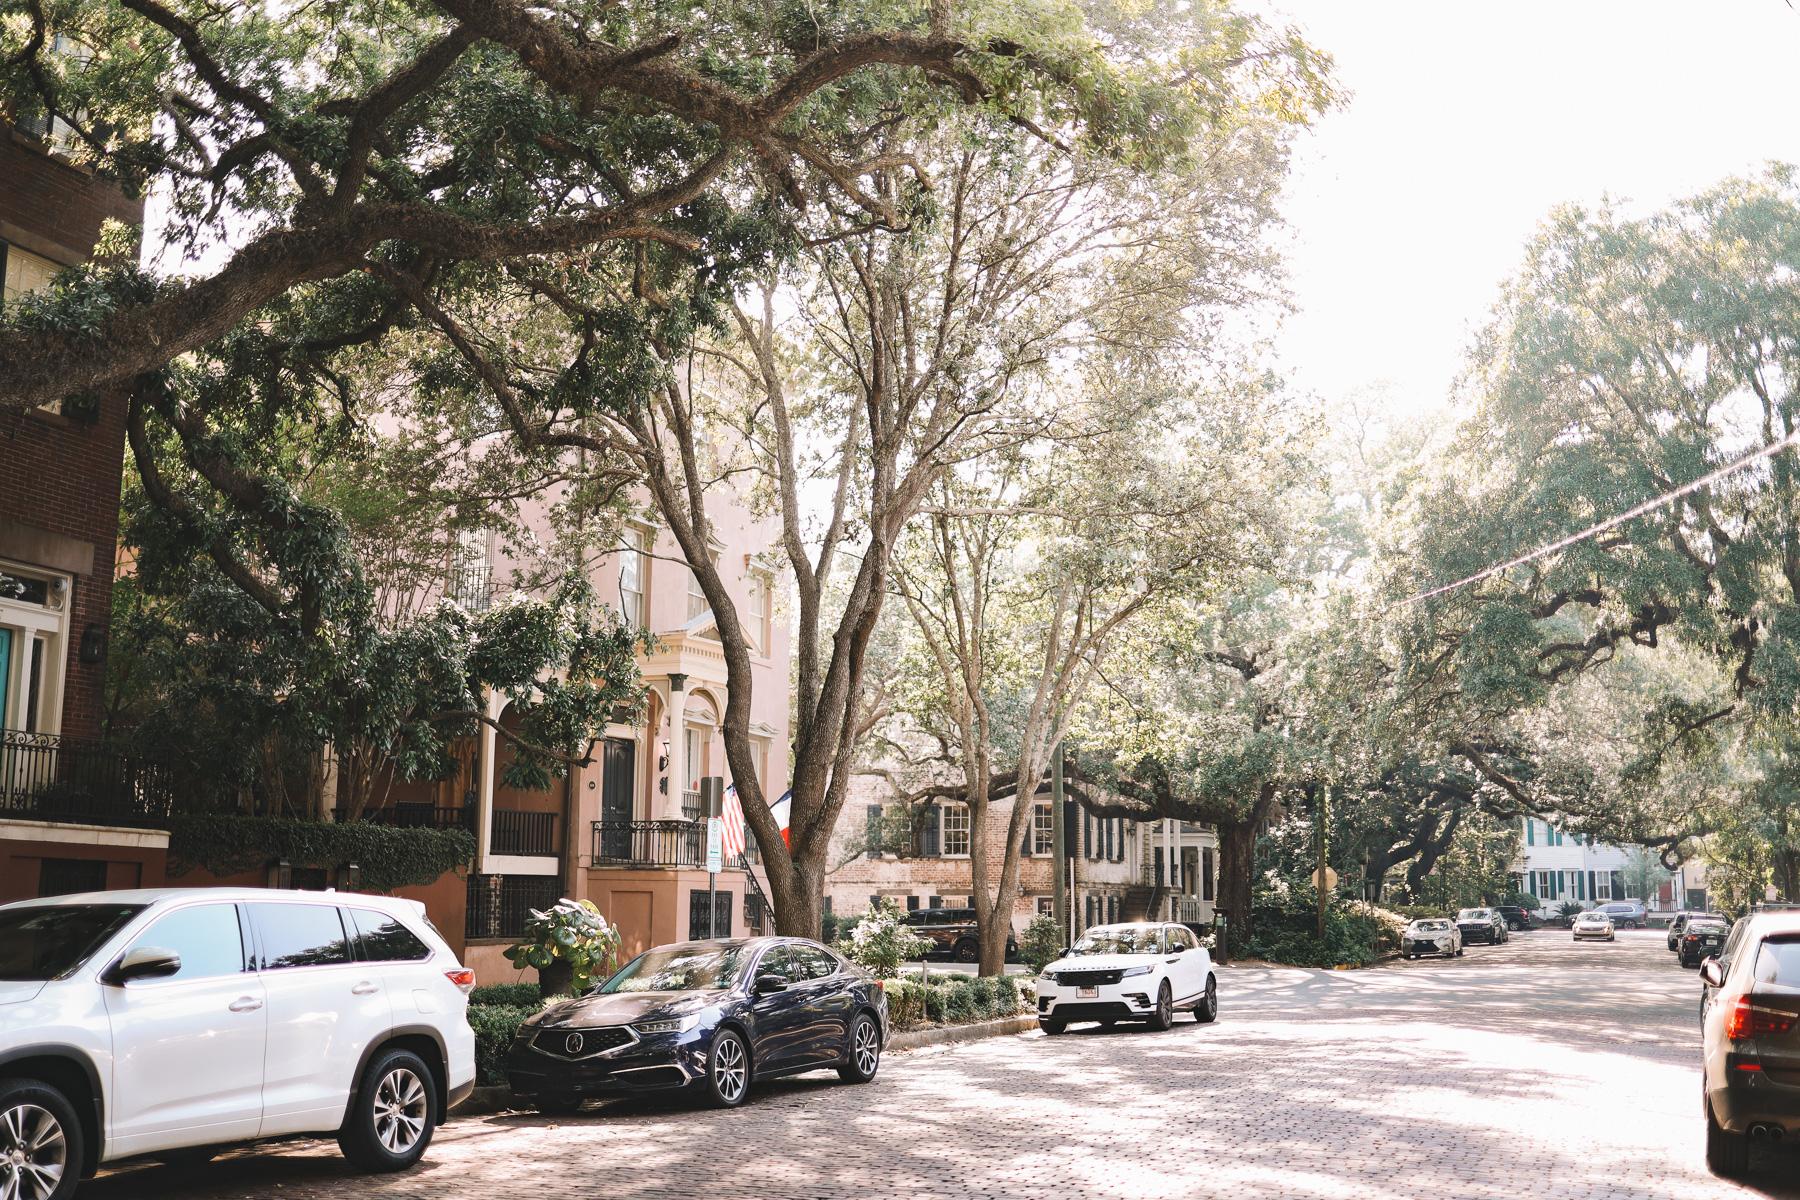 Savannah travel itinerary